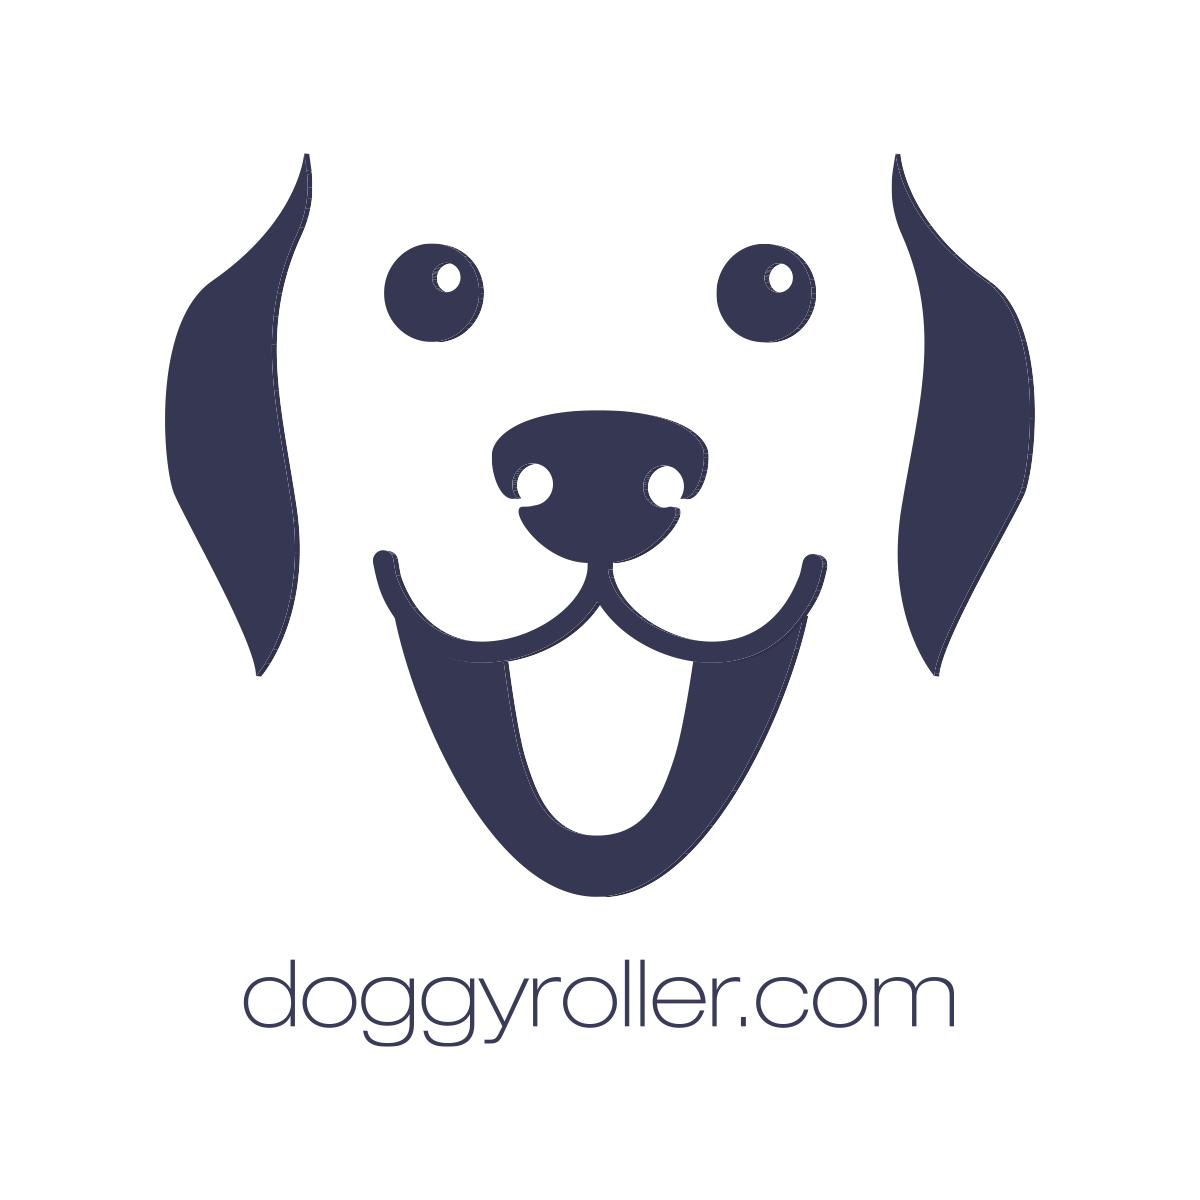 Logo Doggyroller dunkelblau